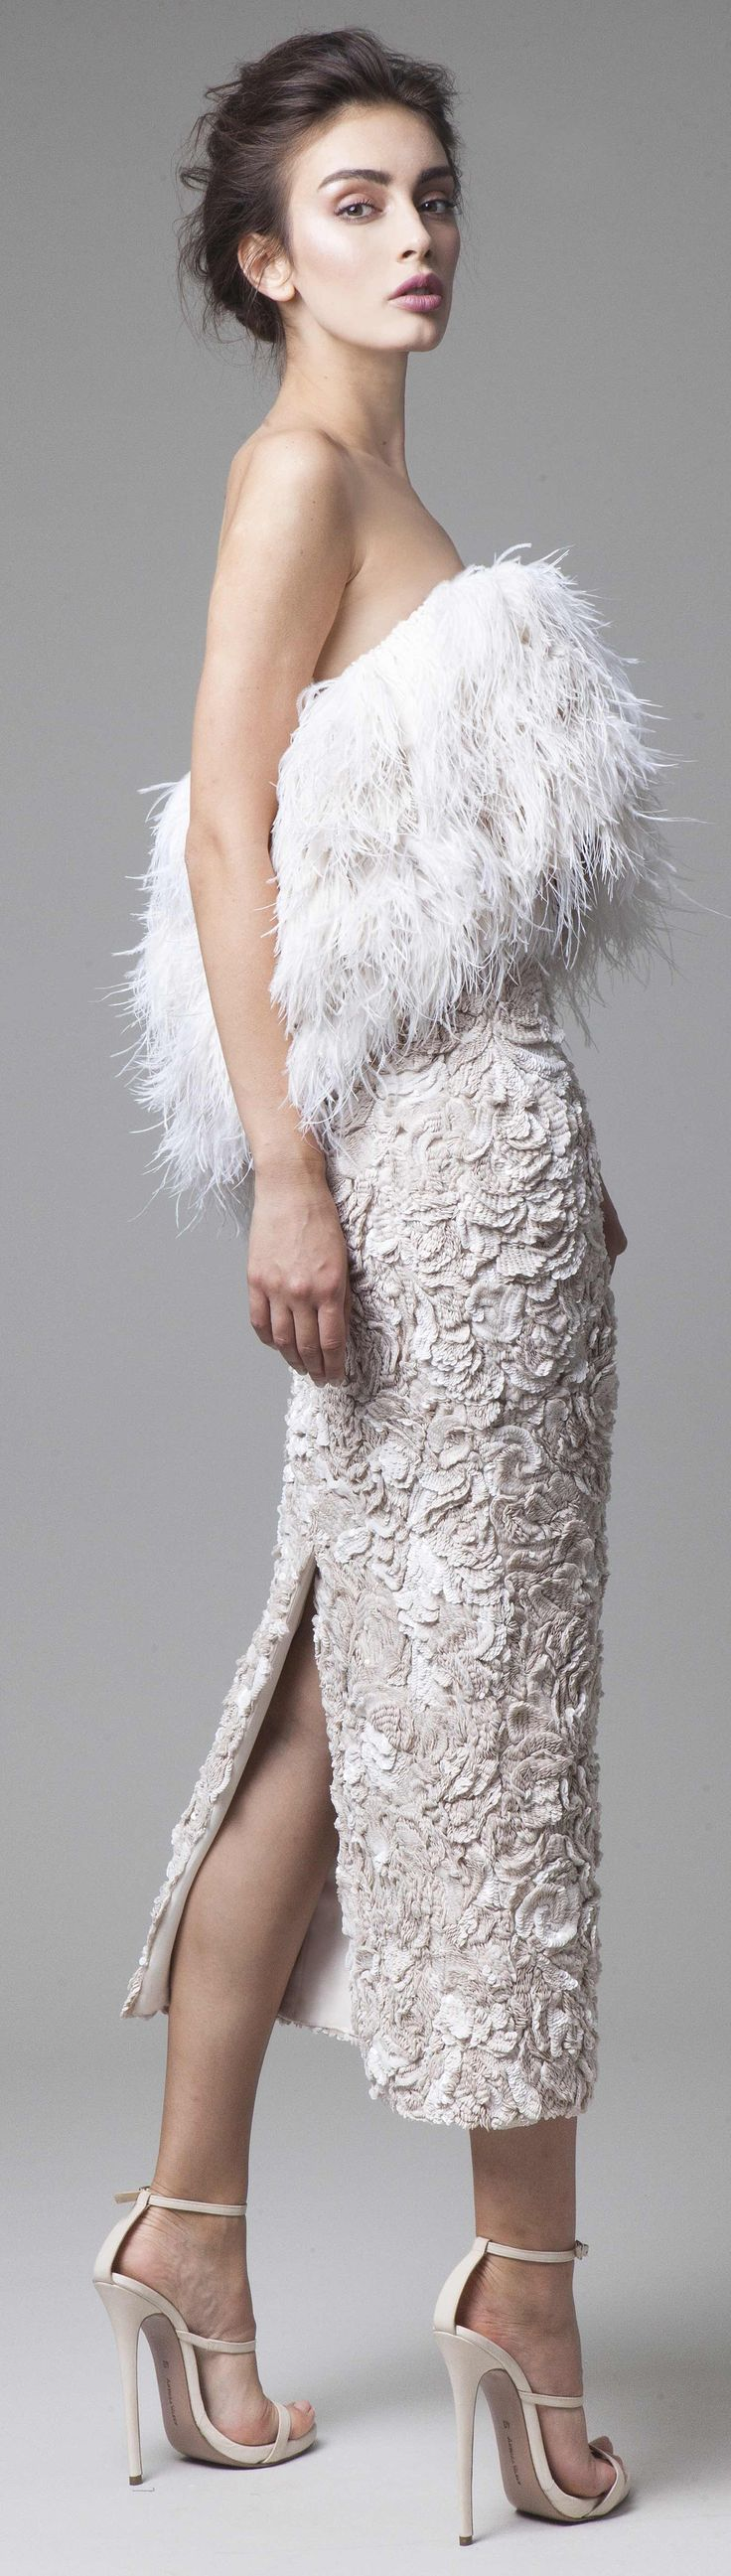 Krikor Jabotian couture 2016 spring summer  www.aromatiqueessentials.com.au